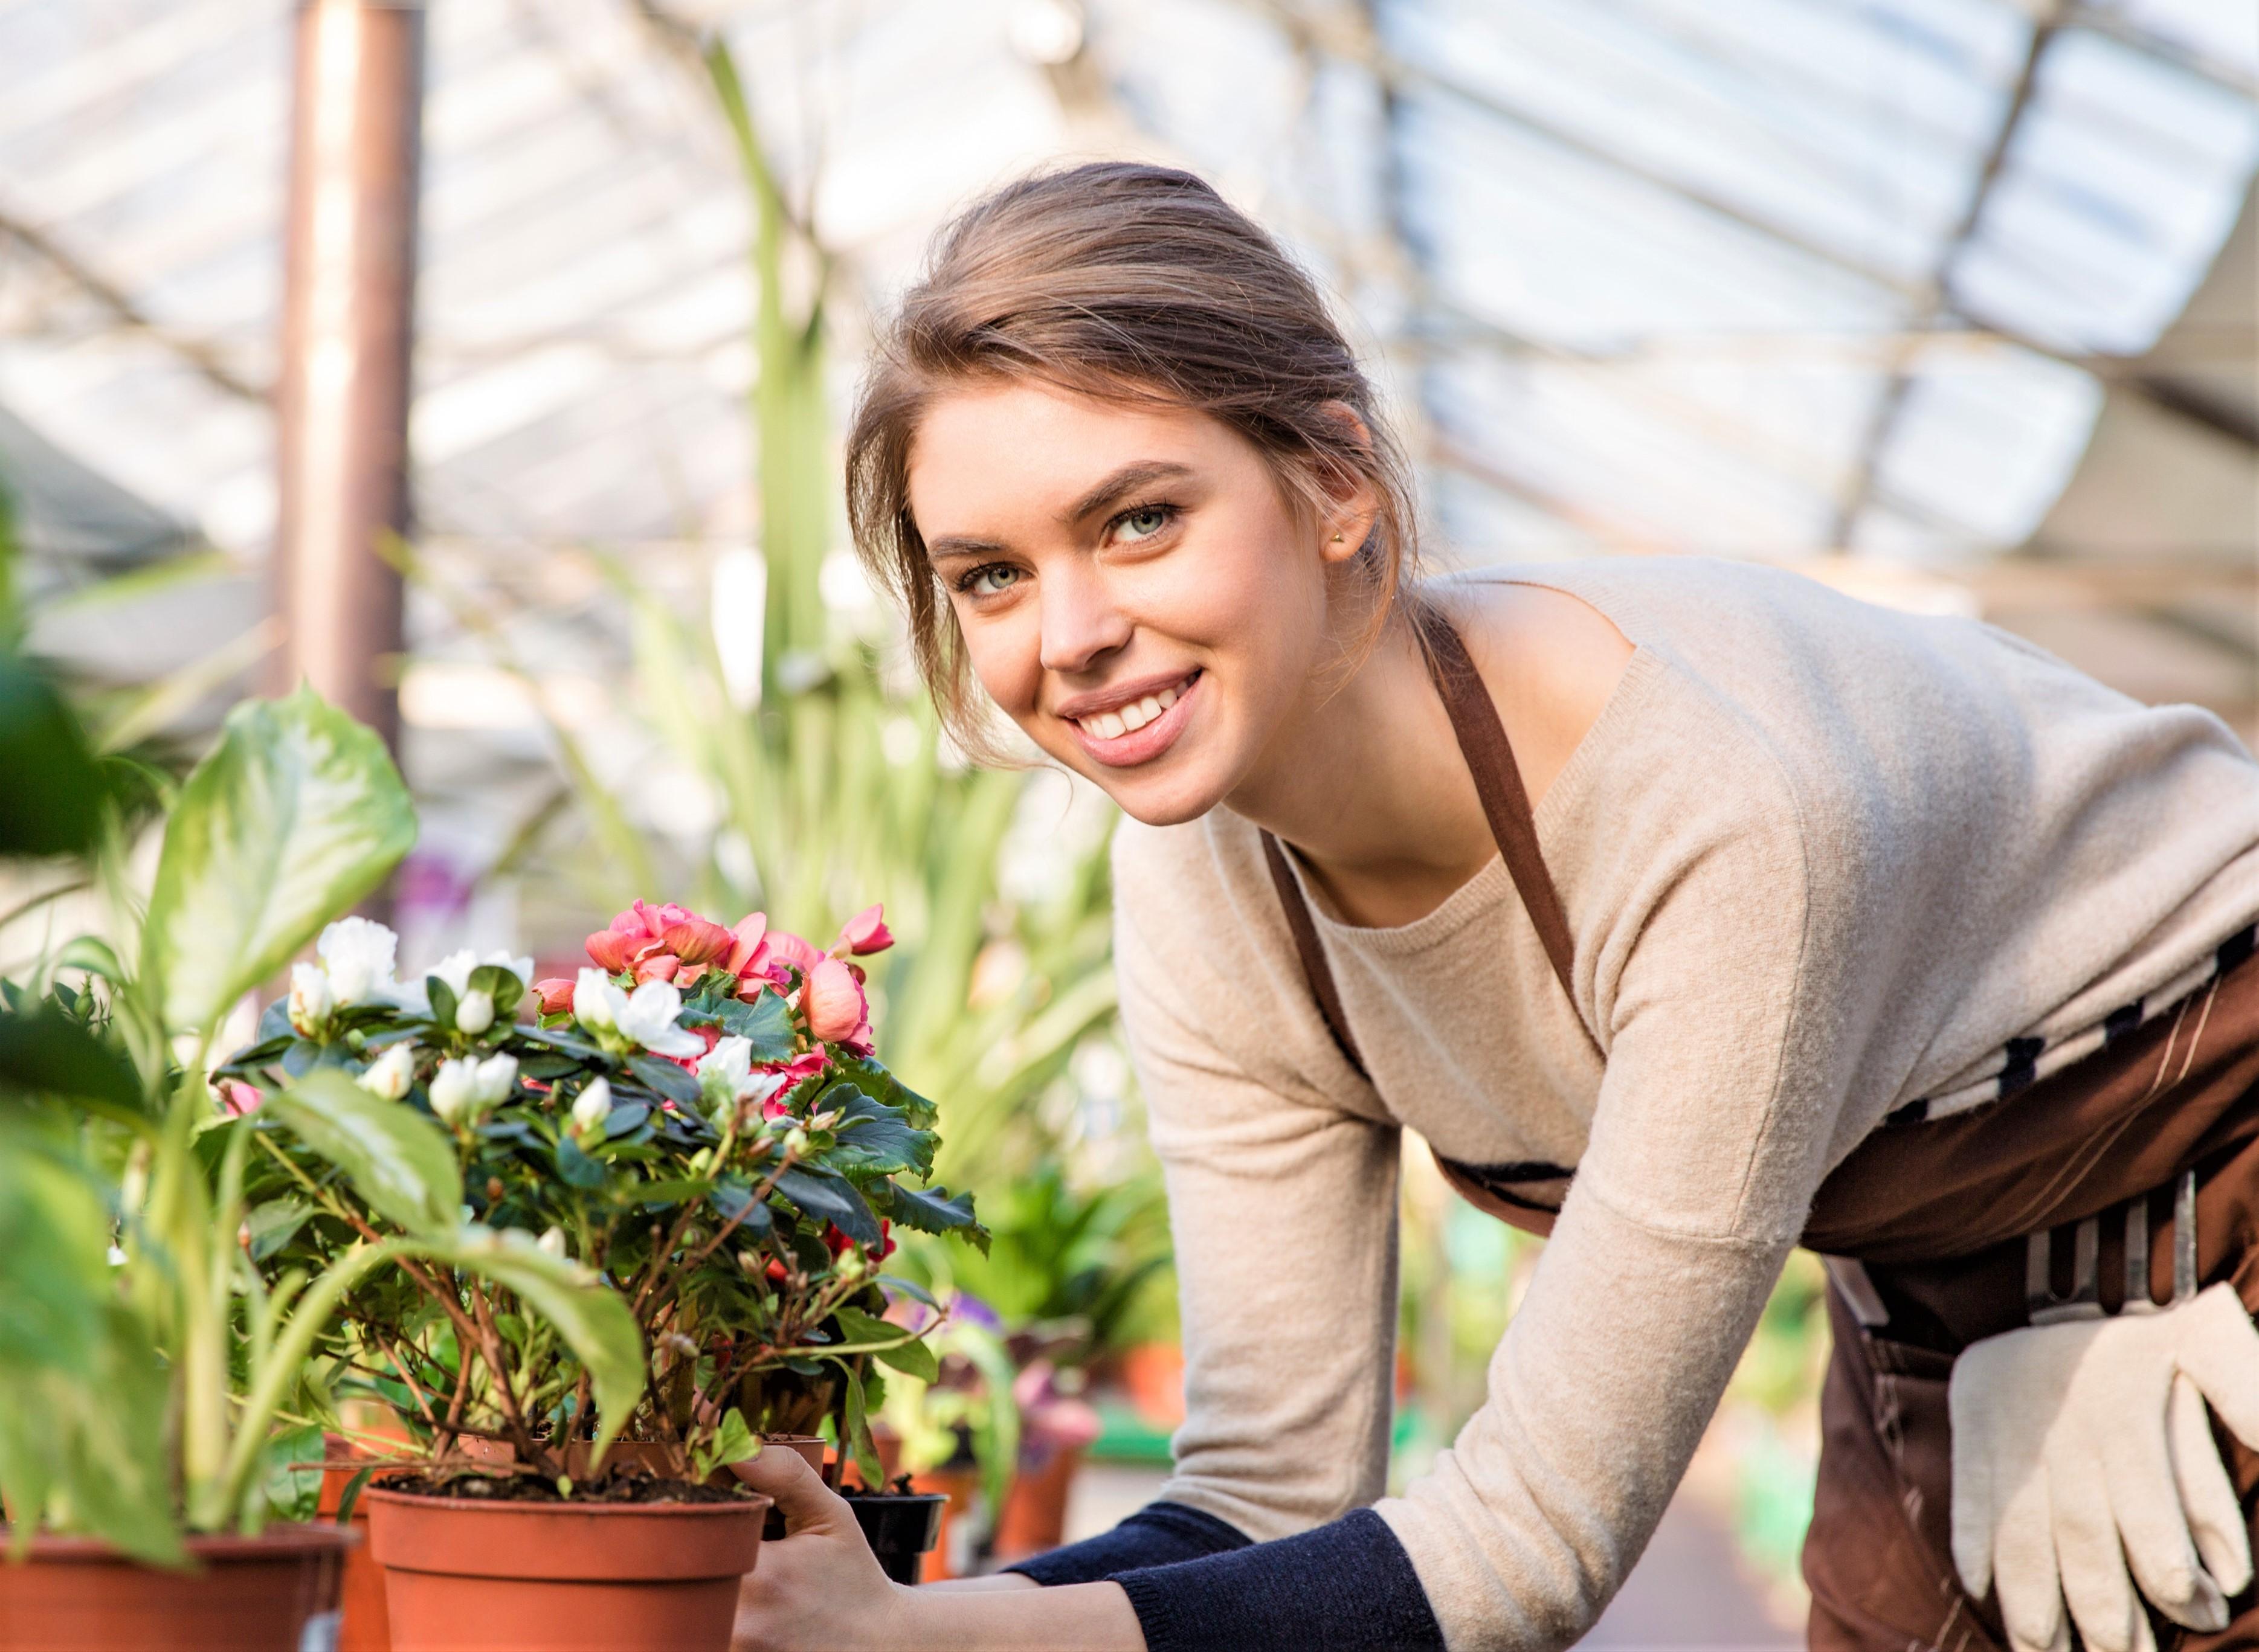 Production worker (flower arranger)